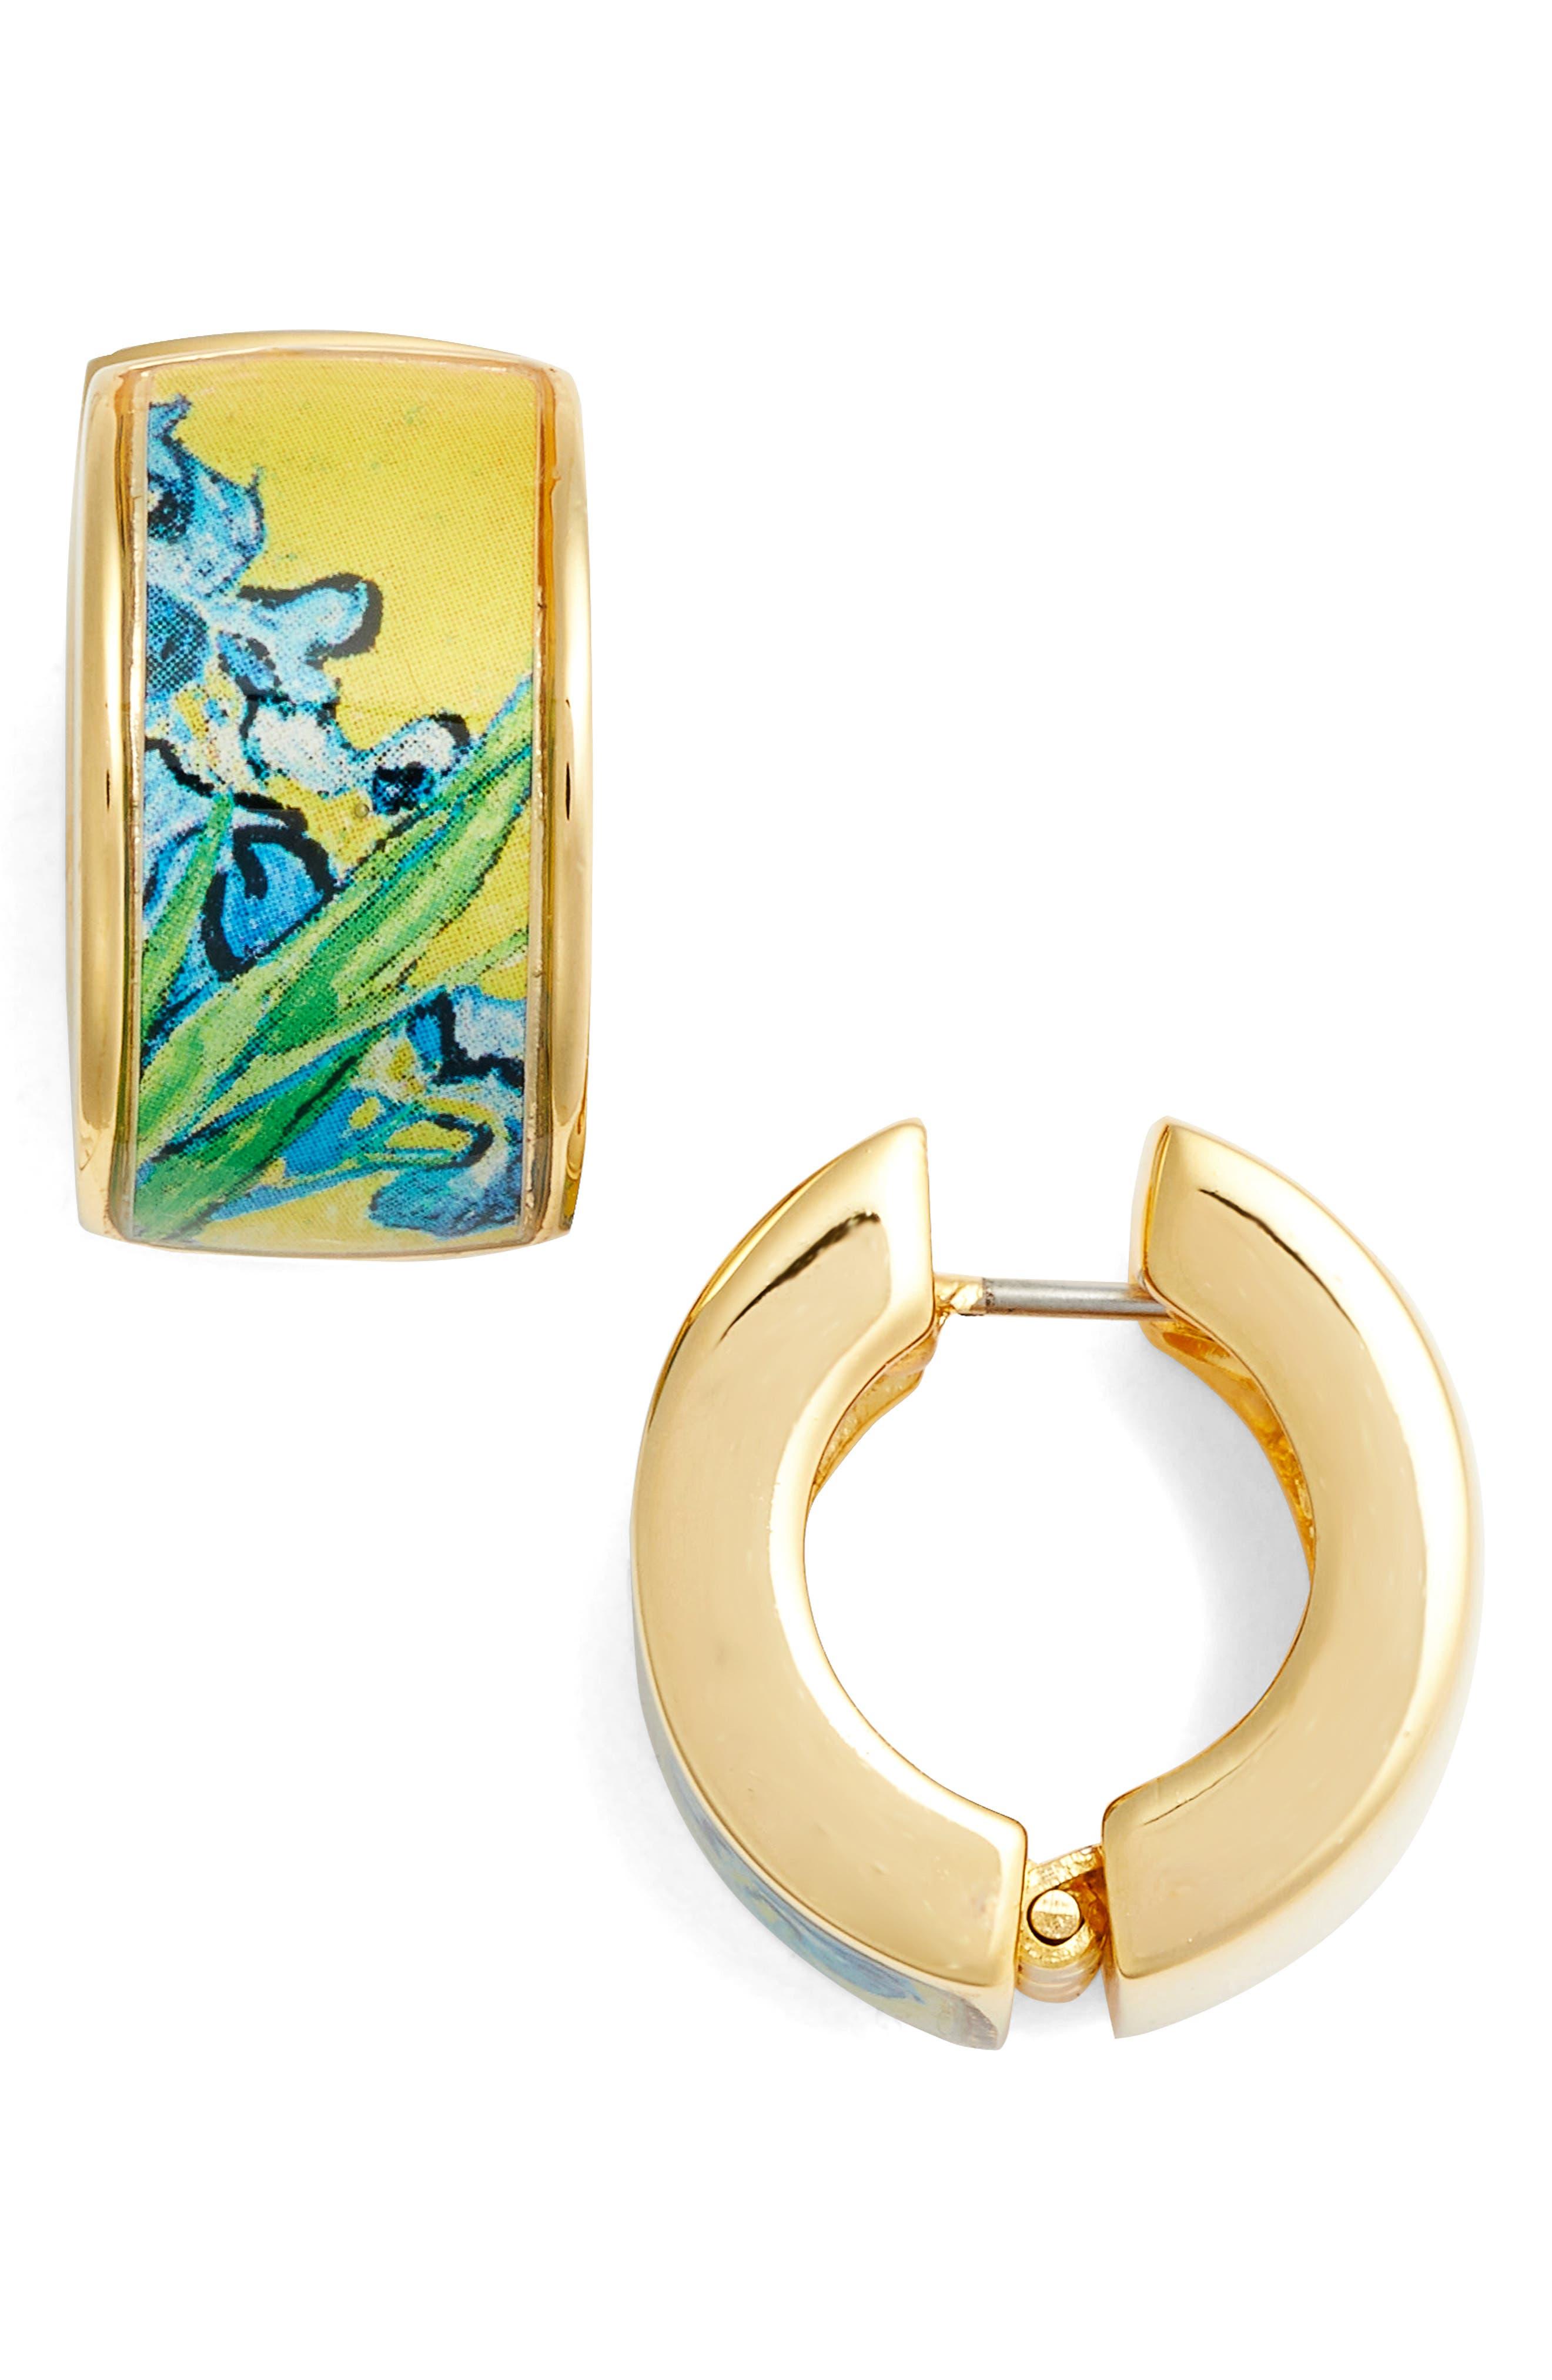 Irises Earrings,                             Main thumbnail 1, color,                             Yellow/ Gold